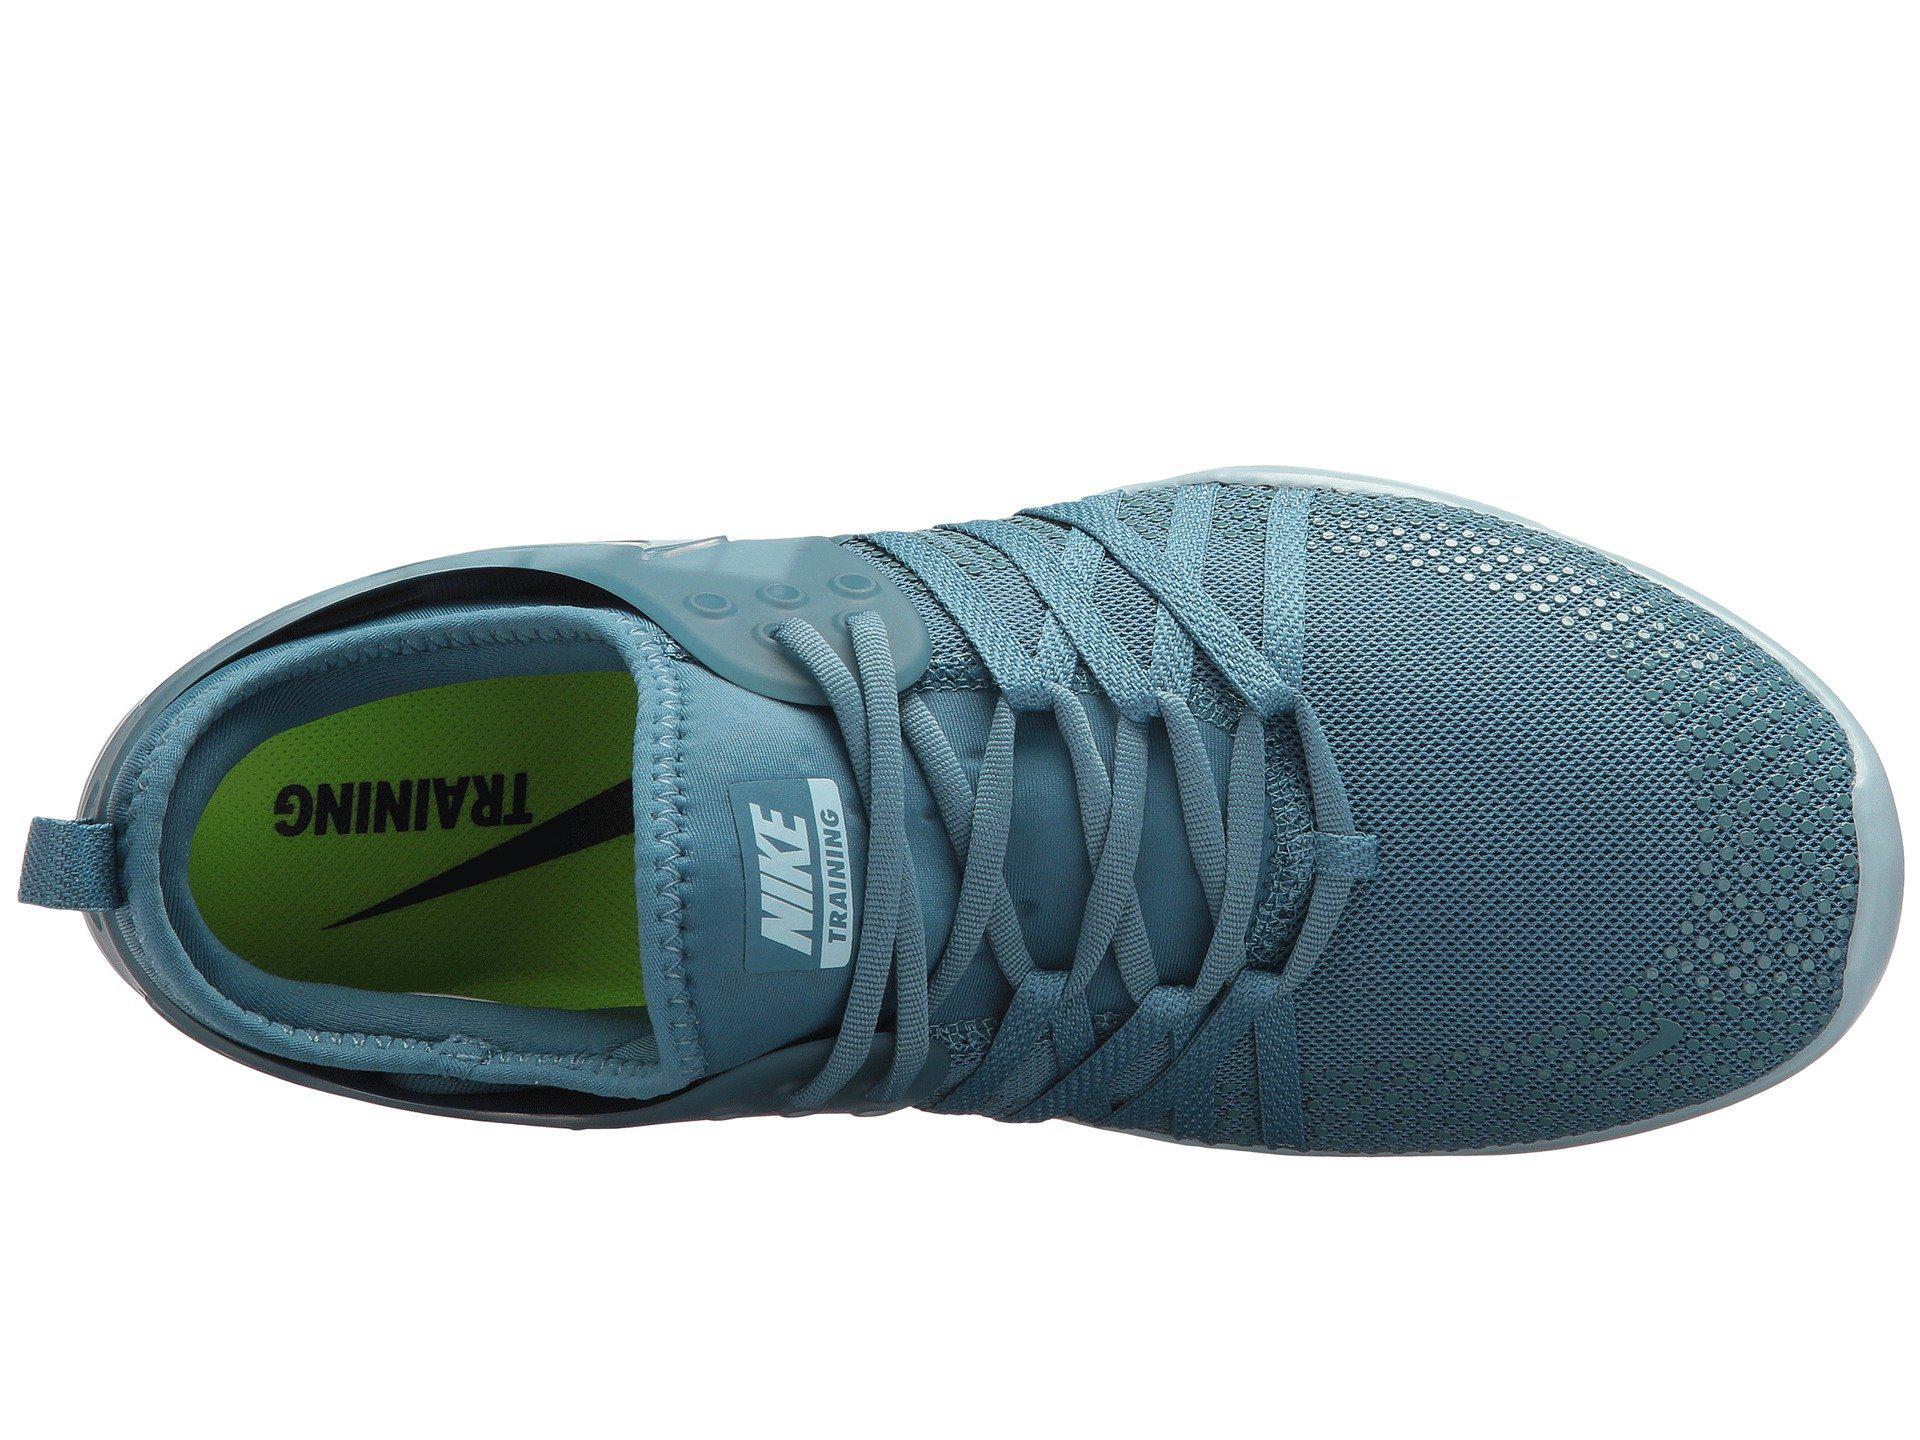 a10d669389c5 Lyst - Nike Free Tr 7 Premium Training in Blue